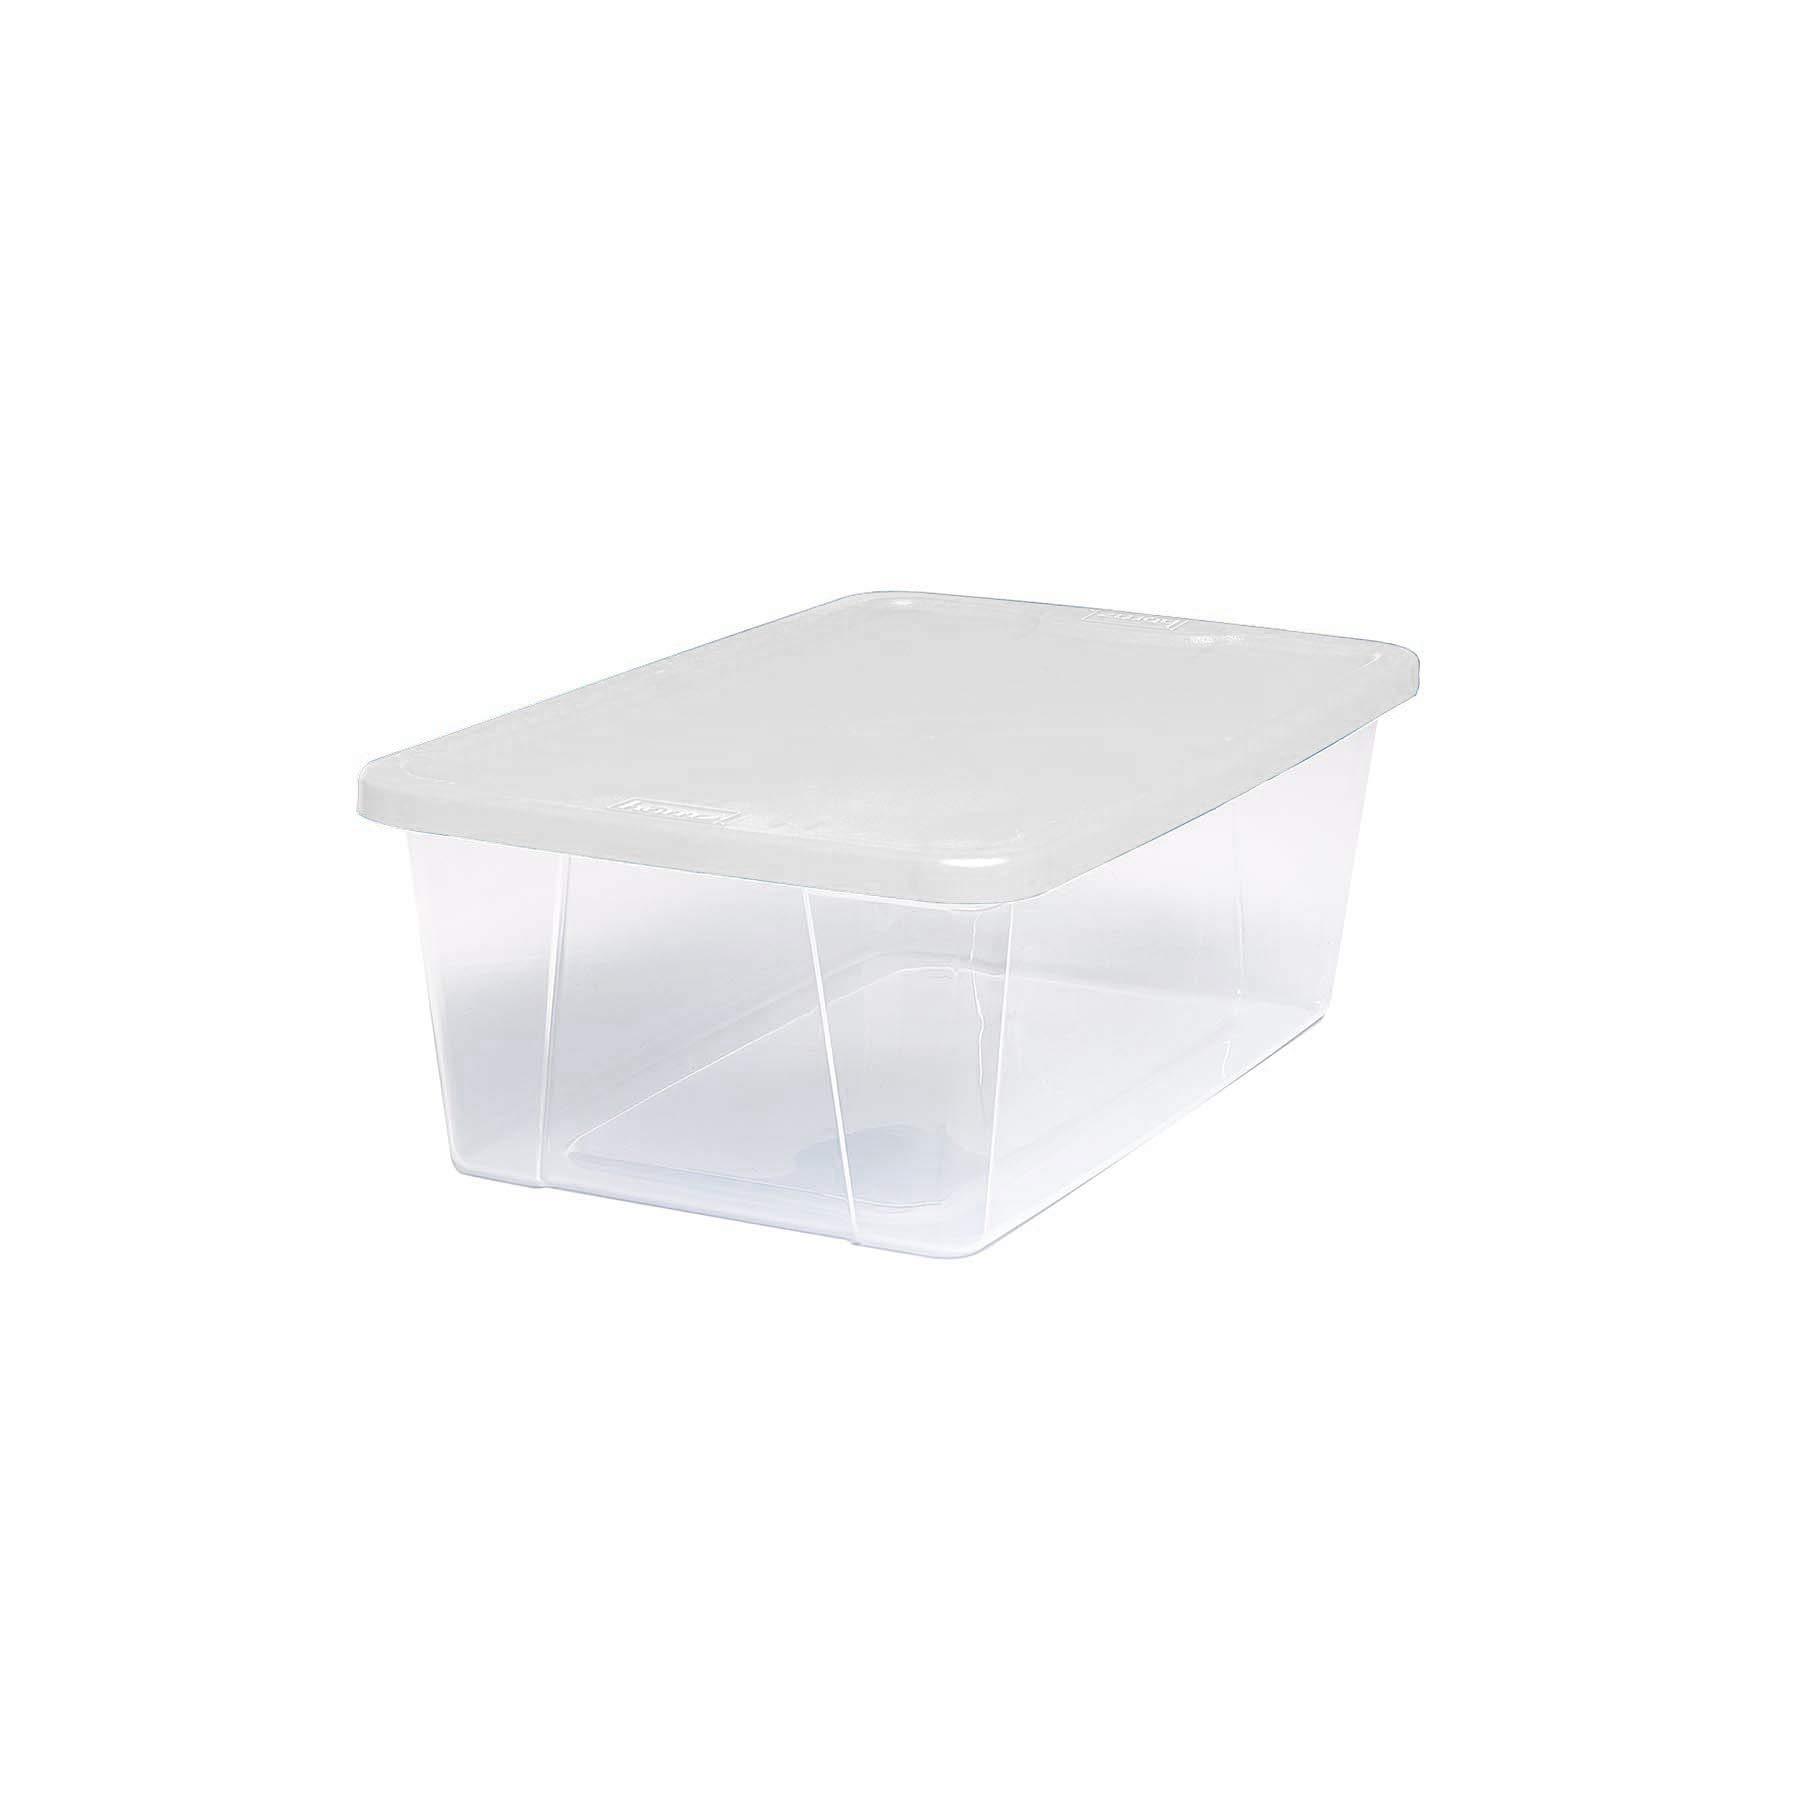 HOMZ Plastic Storage Bins, Snap Lock White Lids, 6 Quart, Clear, Stackable, 10-Pack